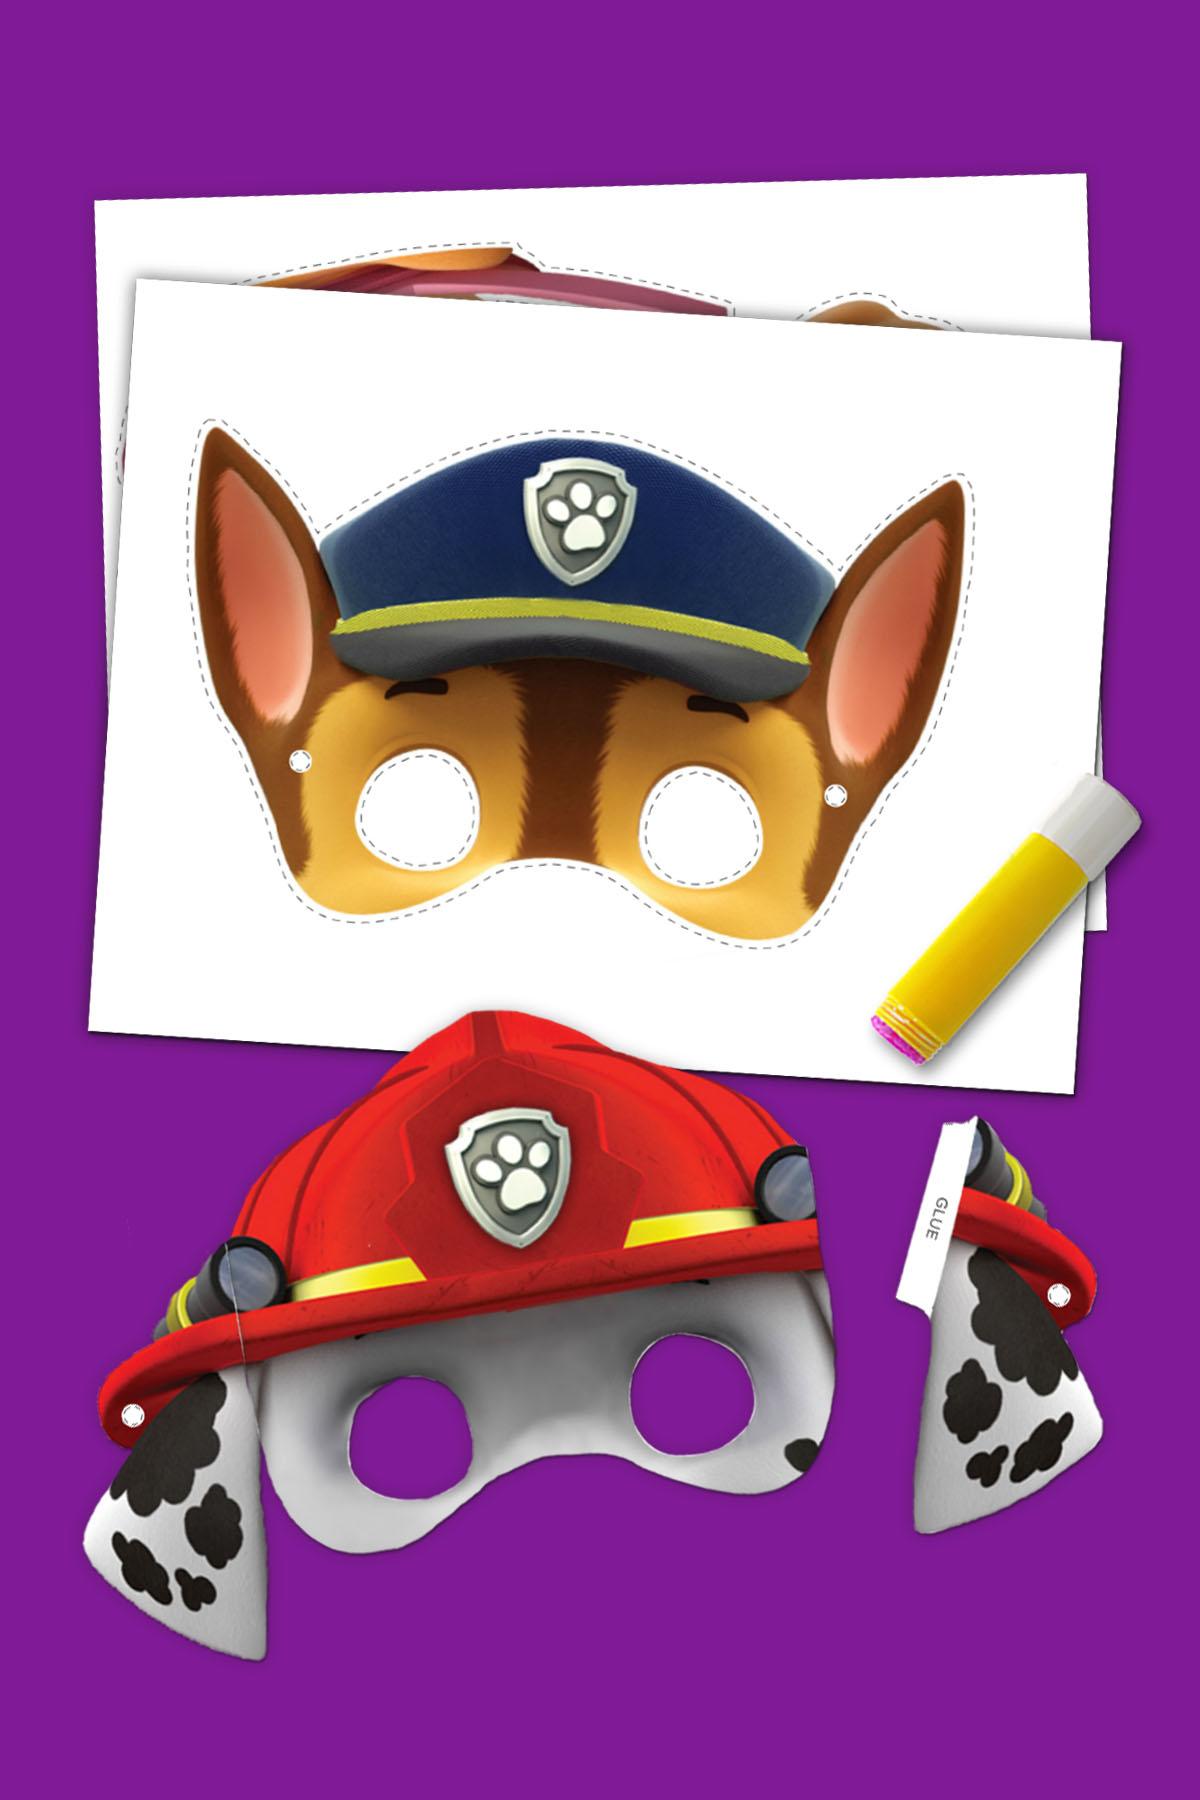 Paw patrol halloween clipart freeuse 5 PAW Patrol Halloween Printables | Nickelodeon Parents freeuse